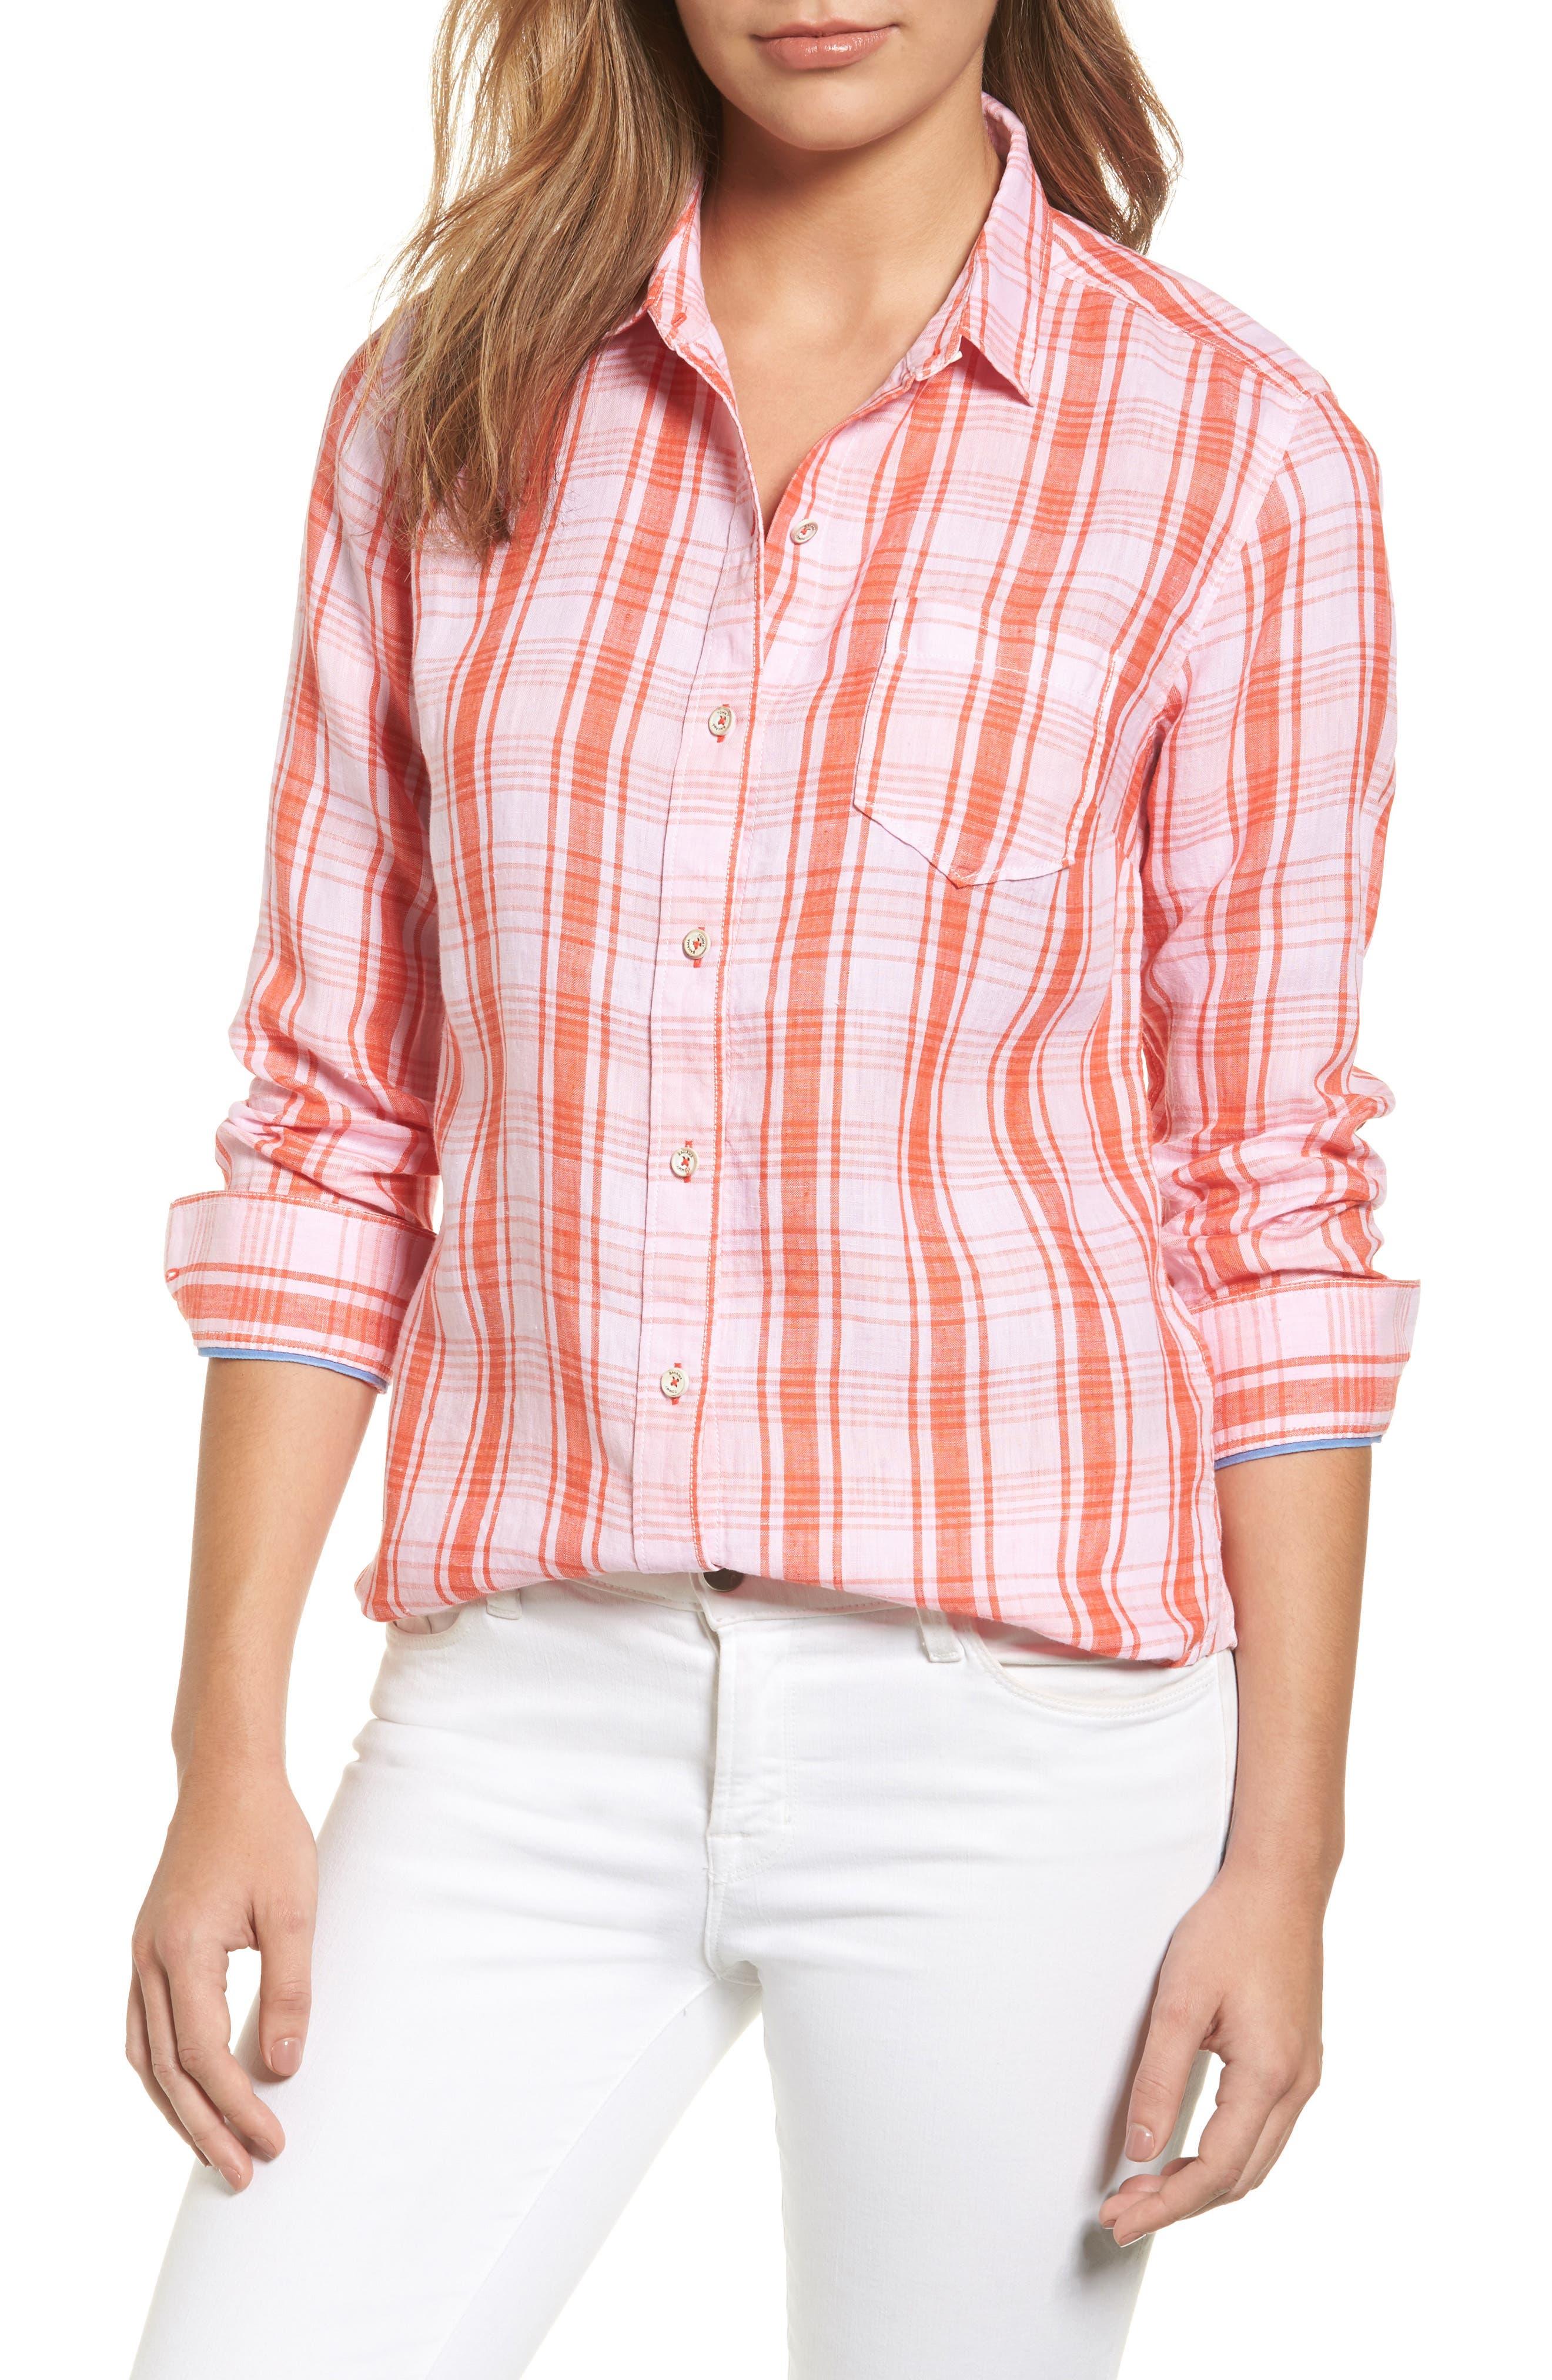 Main Image - Tommy Bahama Athena Plaid Linen Shirt